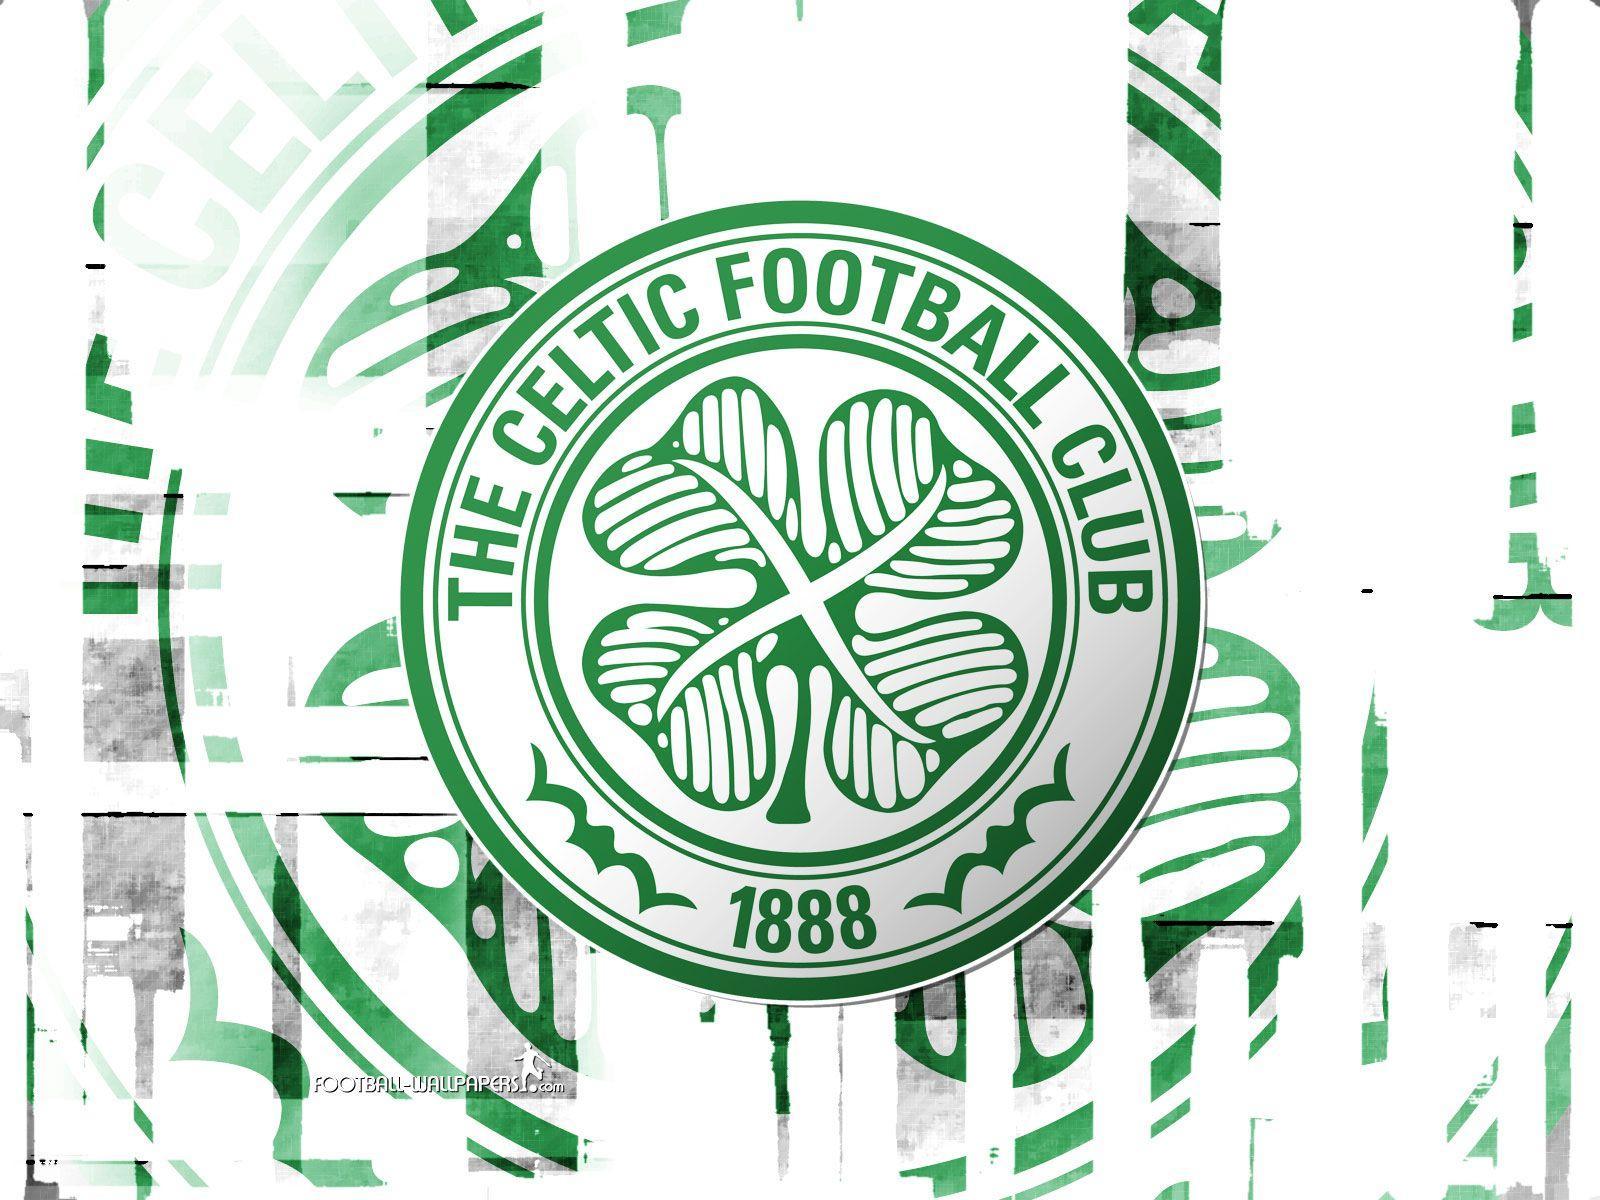 Celtic F.C. Background 8